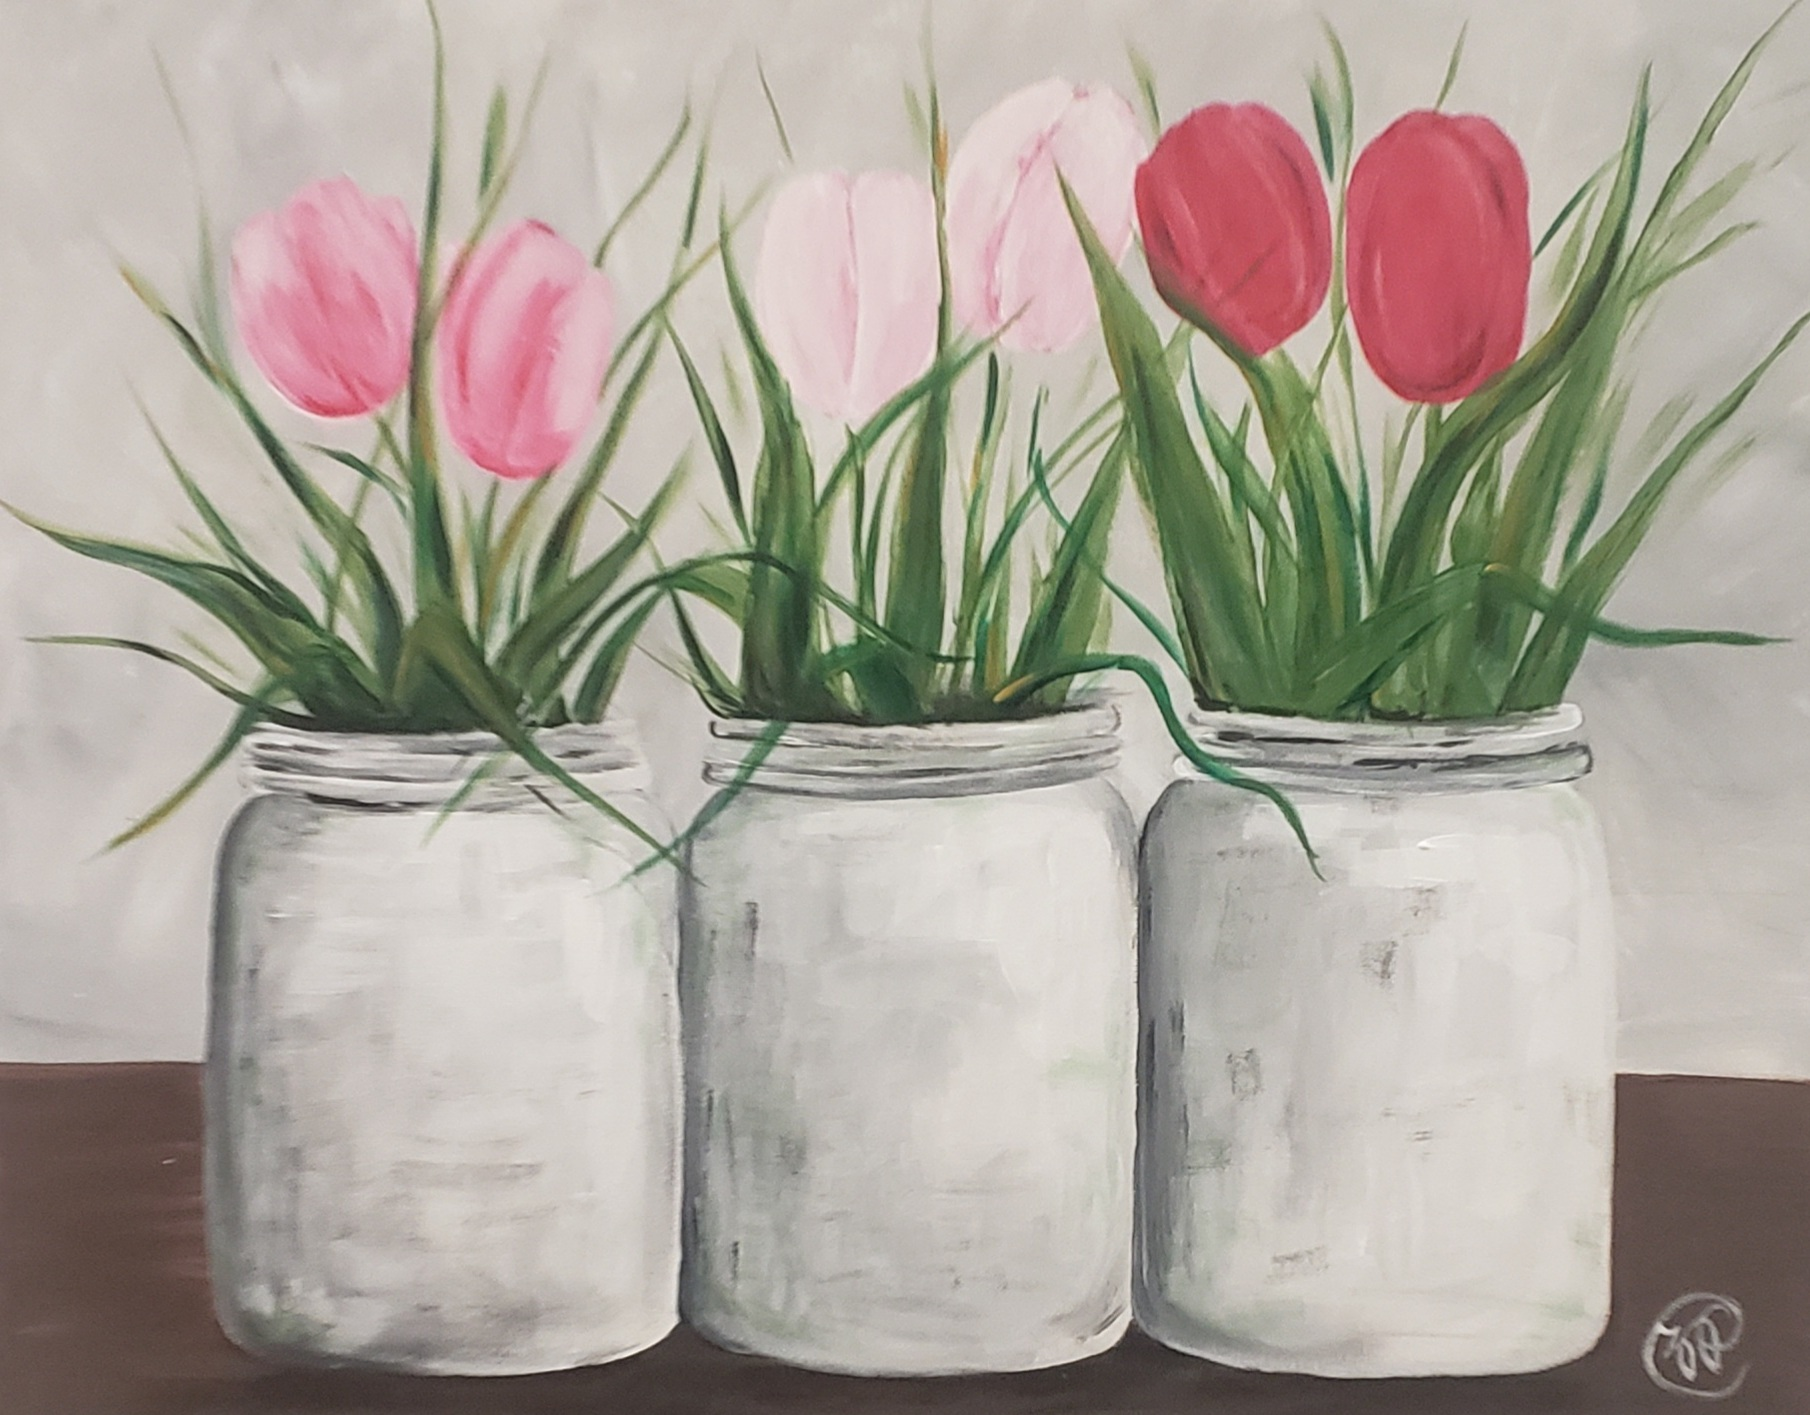 IN-STUDIO: Spring Jars 16x20 Acrylic on Canvas